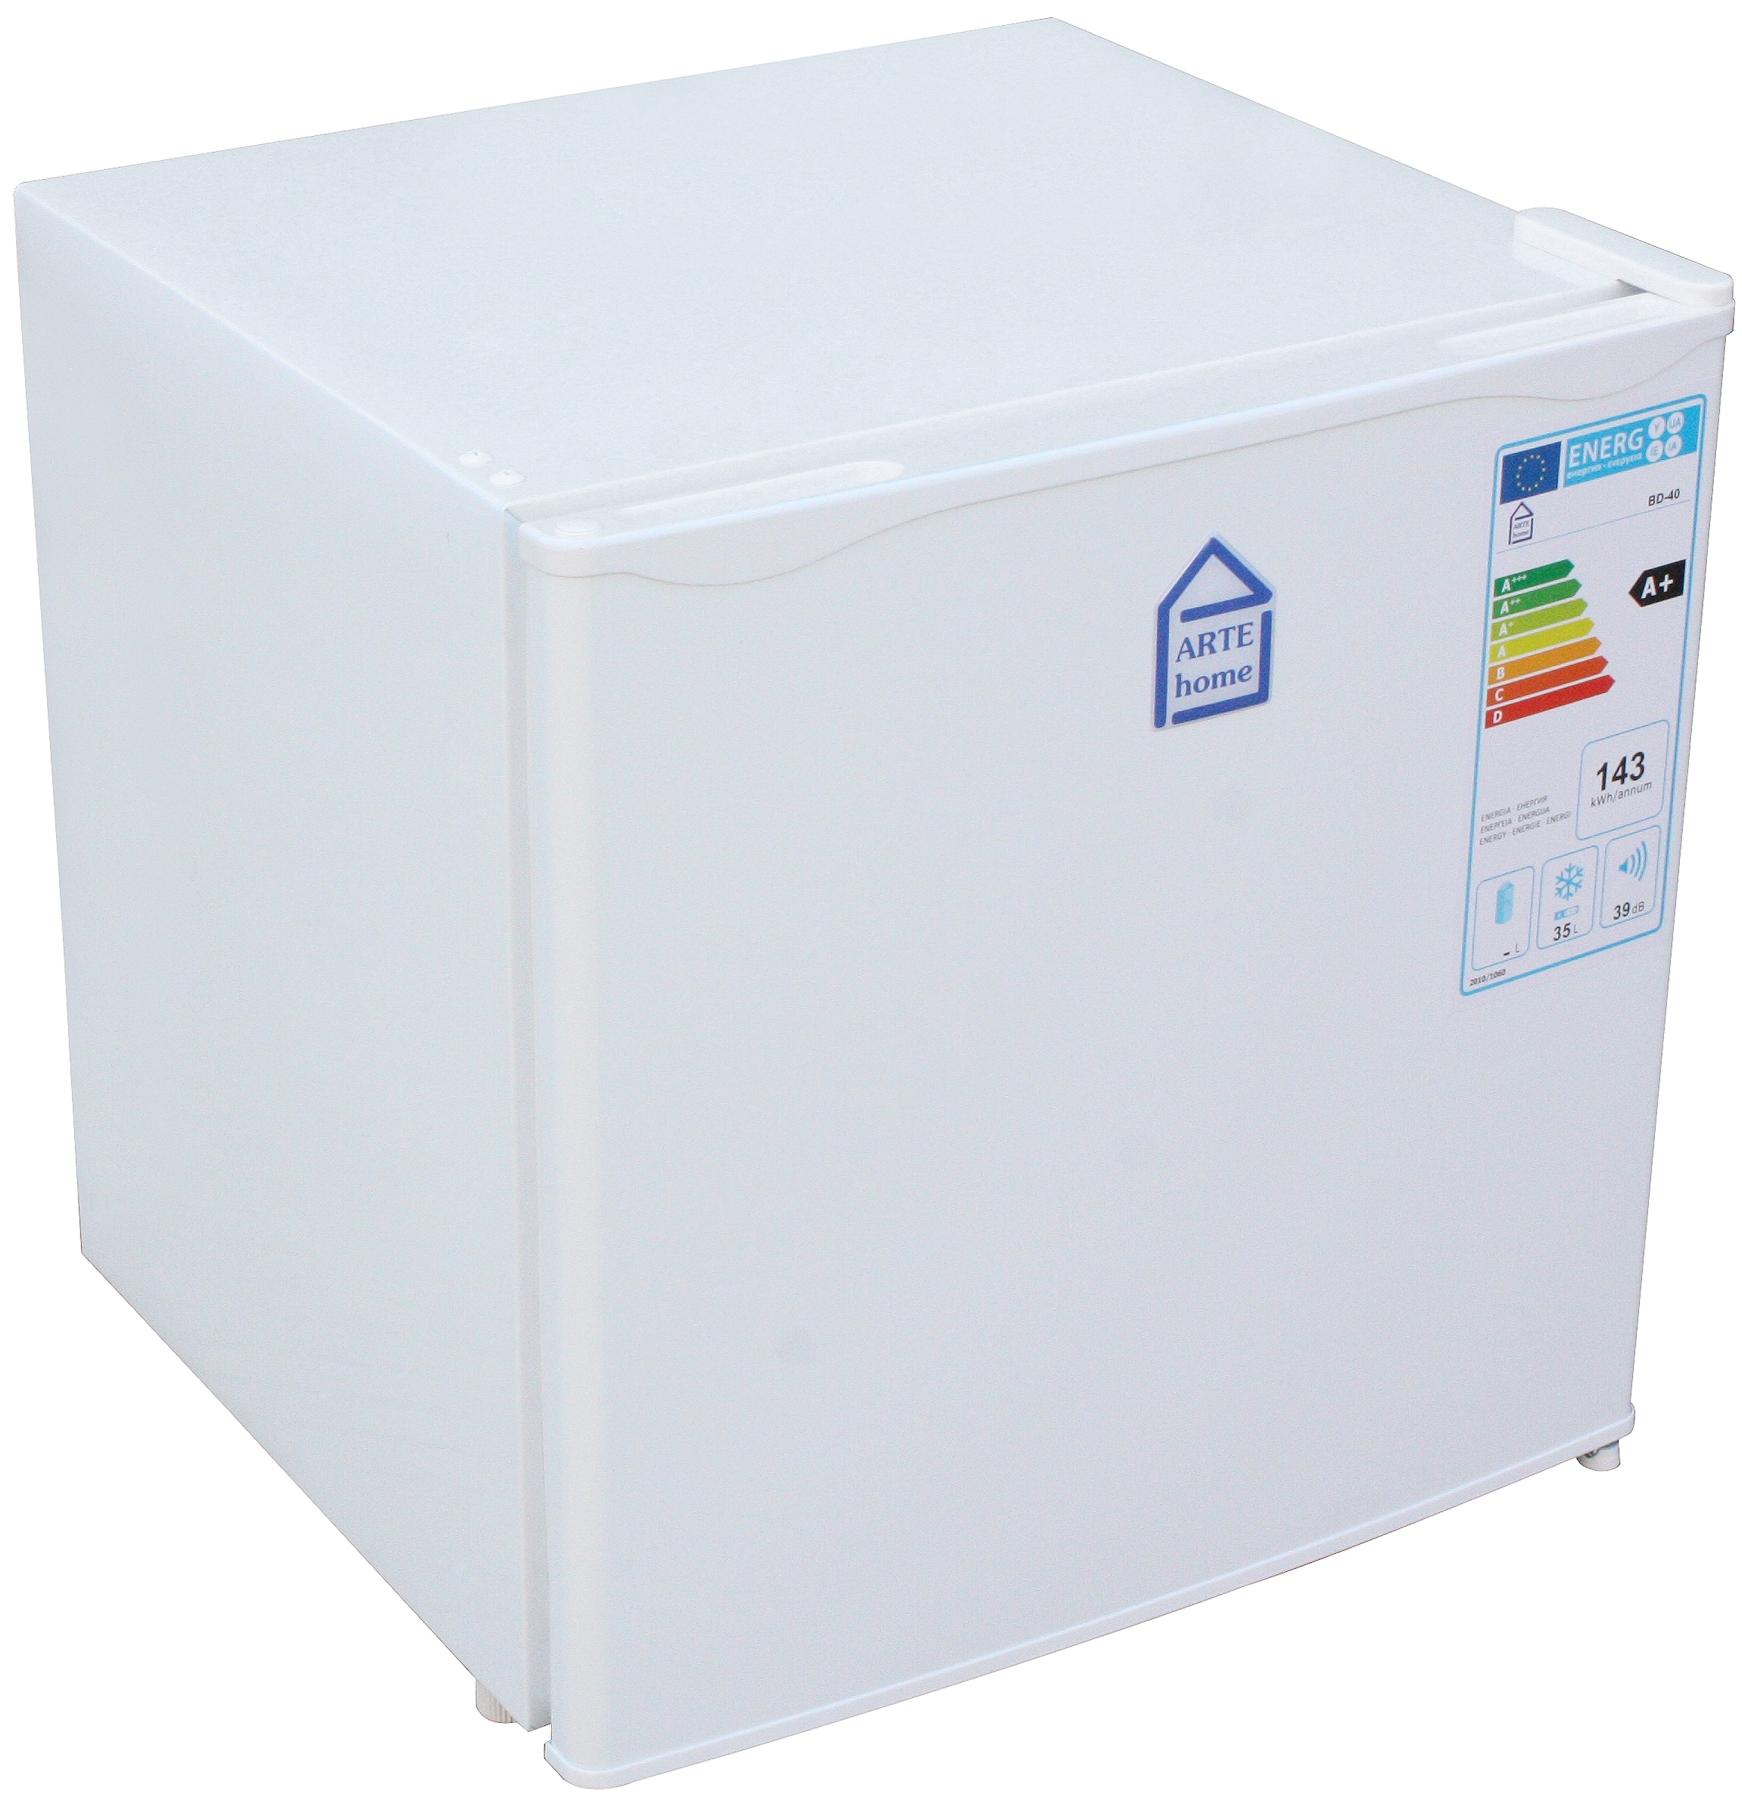 143kWh//a Gefrierbox Eisschrank NEU ARTE HOME AY7107 Gefrierschrank 35 Liter A